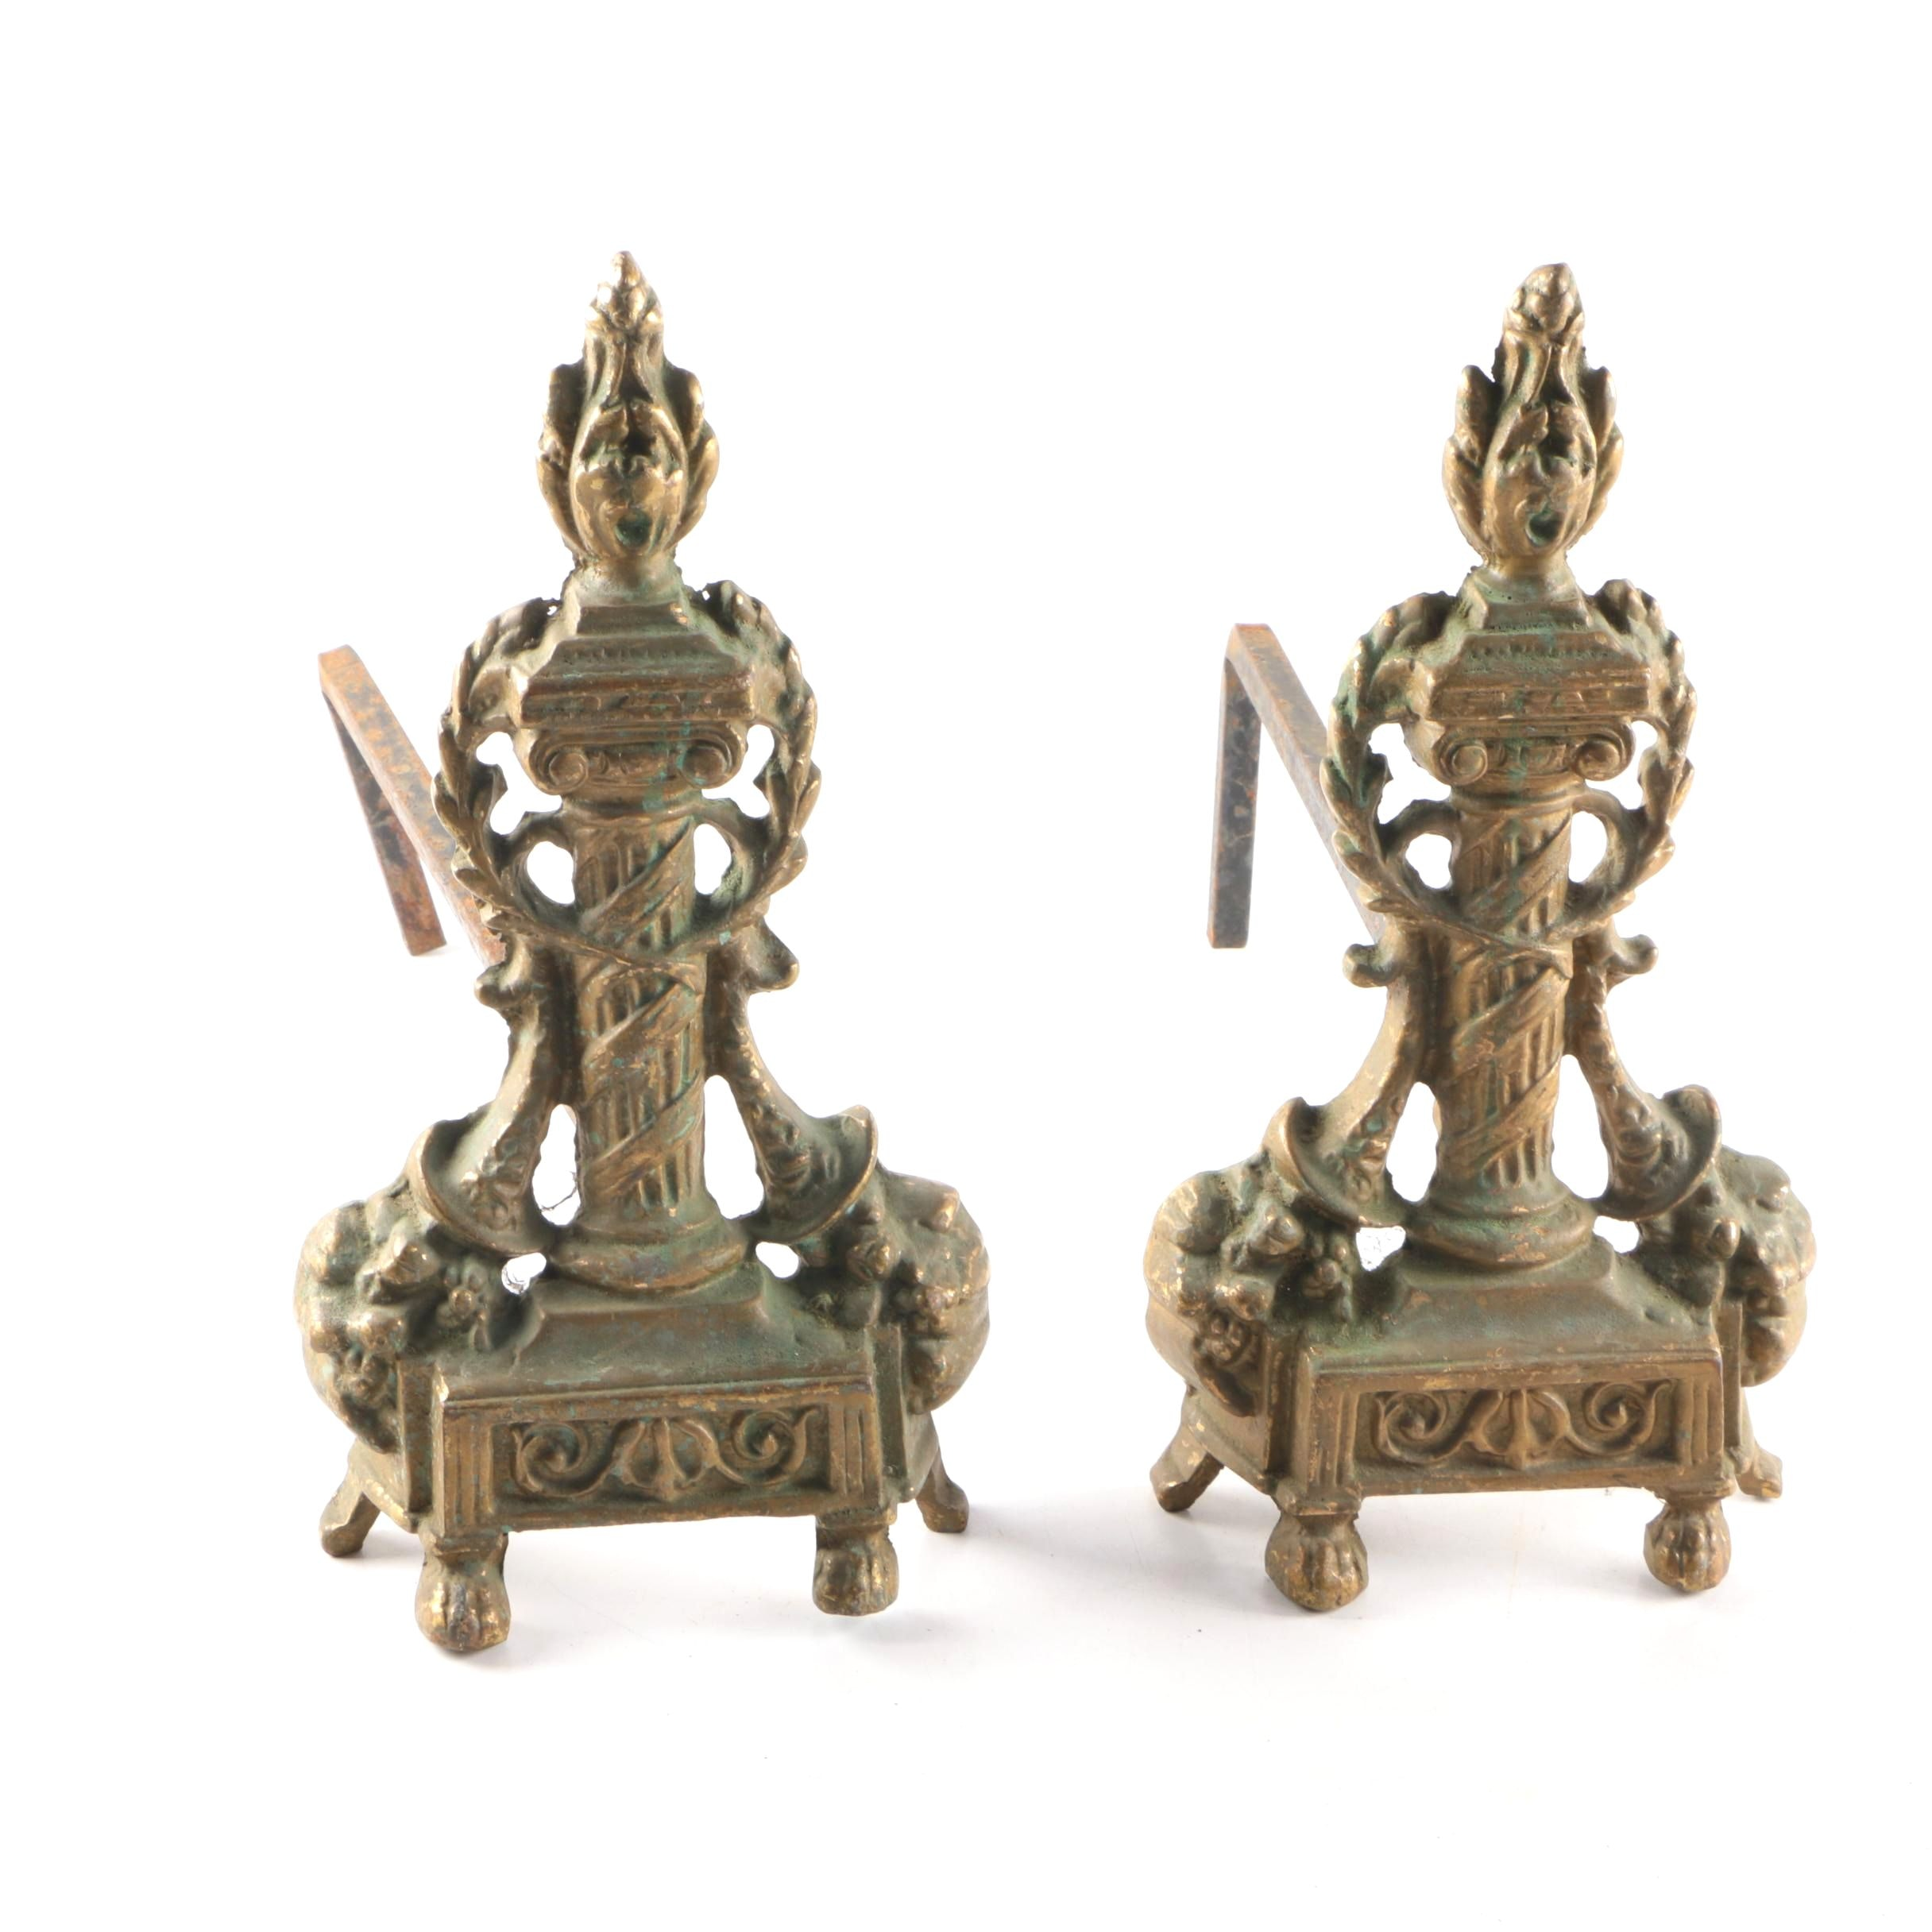 Decorative Vintage Louis XVI Style Brass Andirons